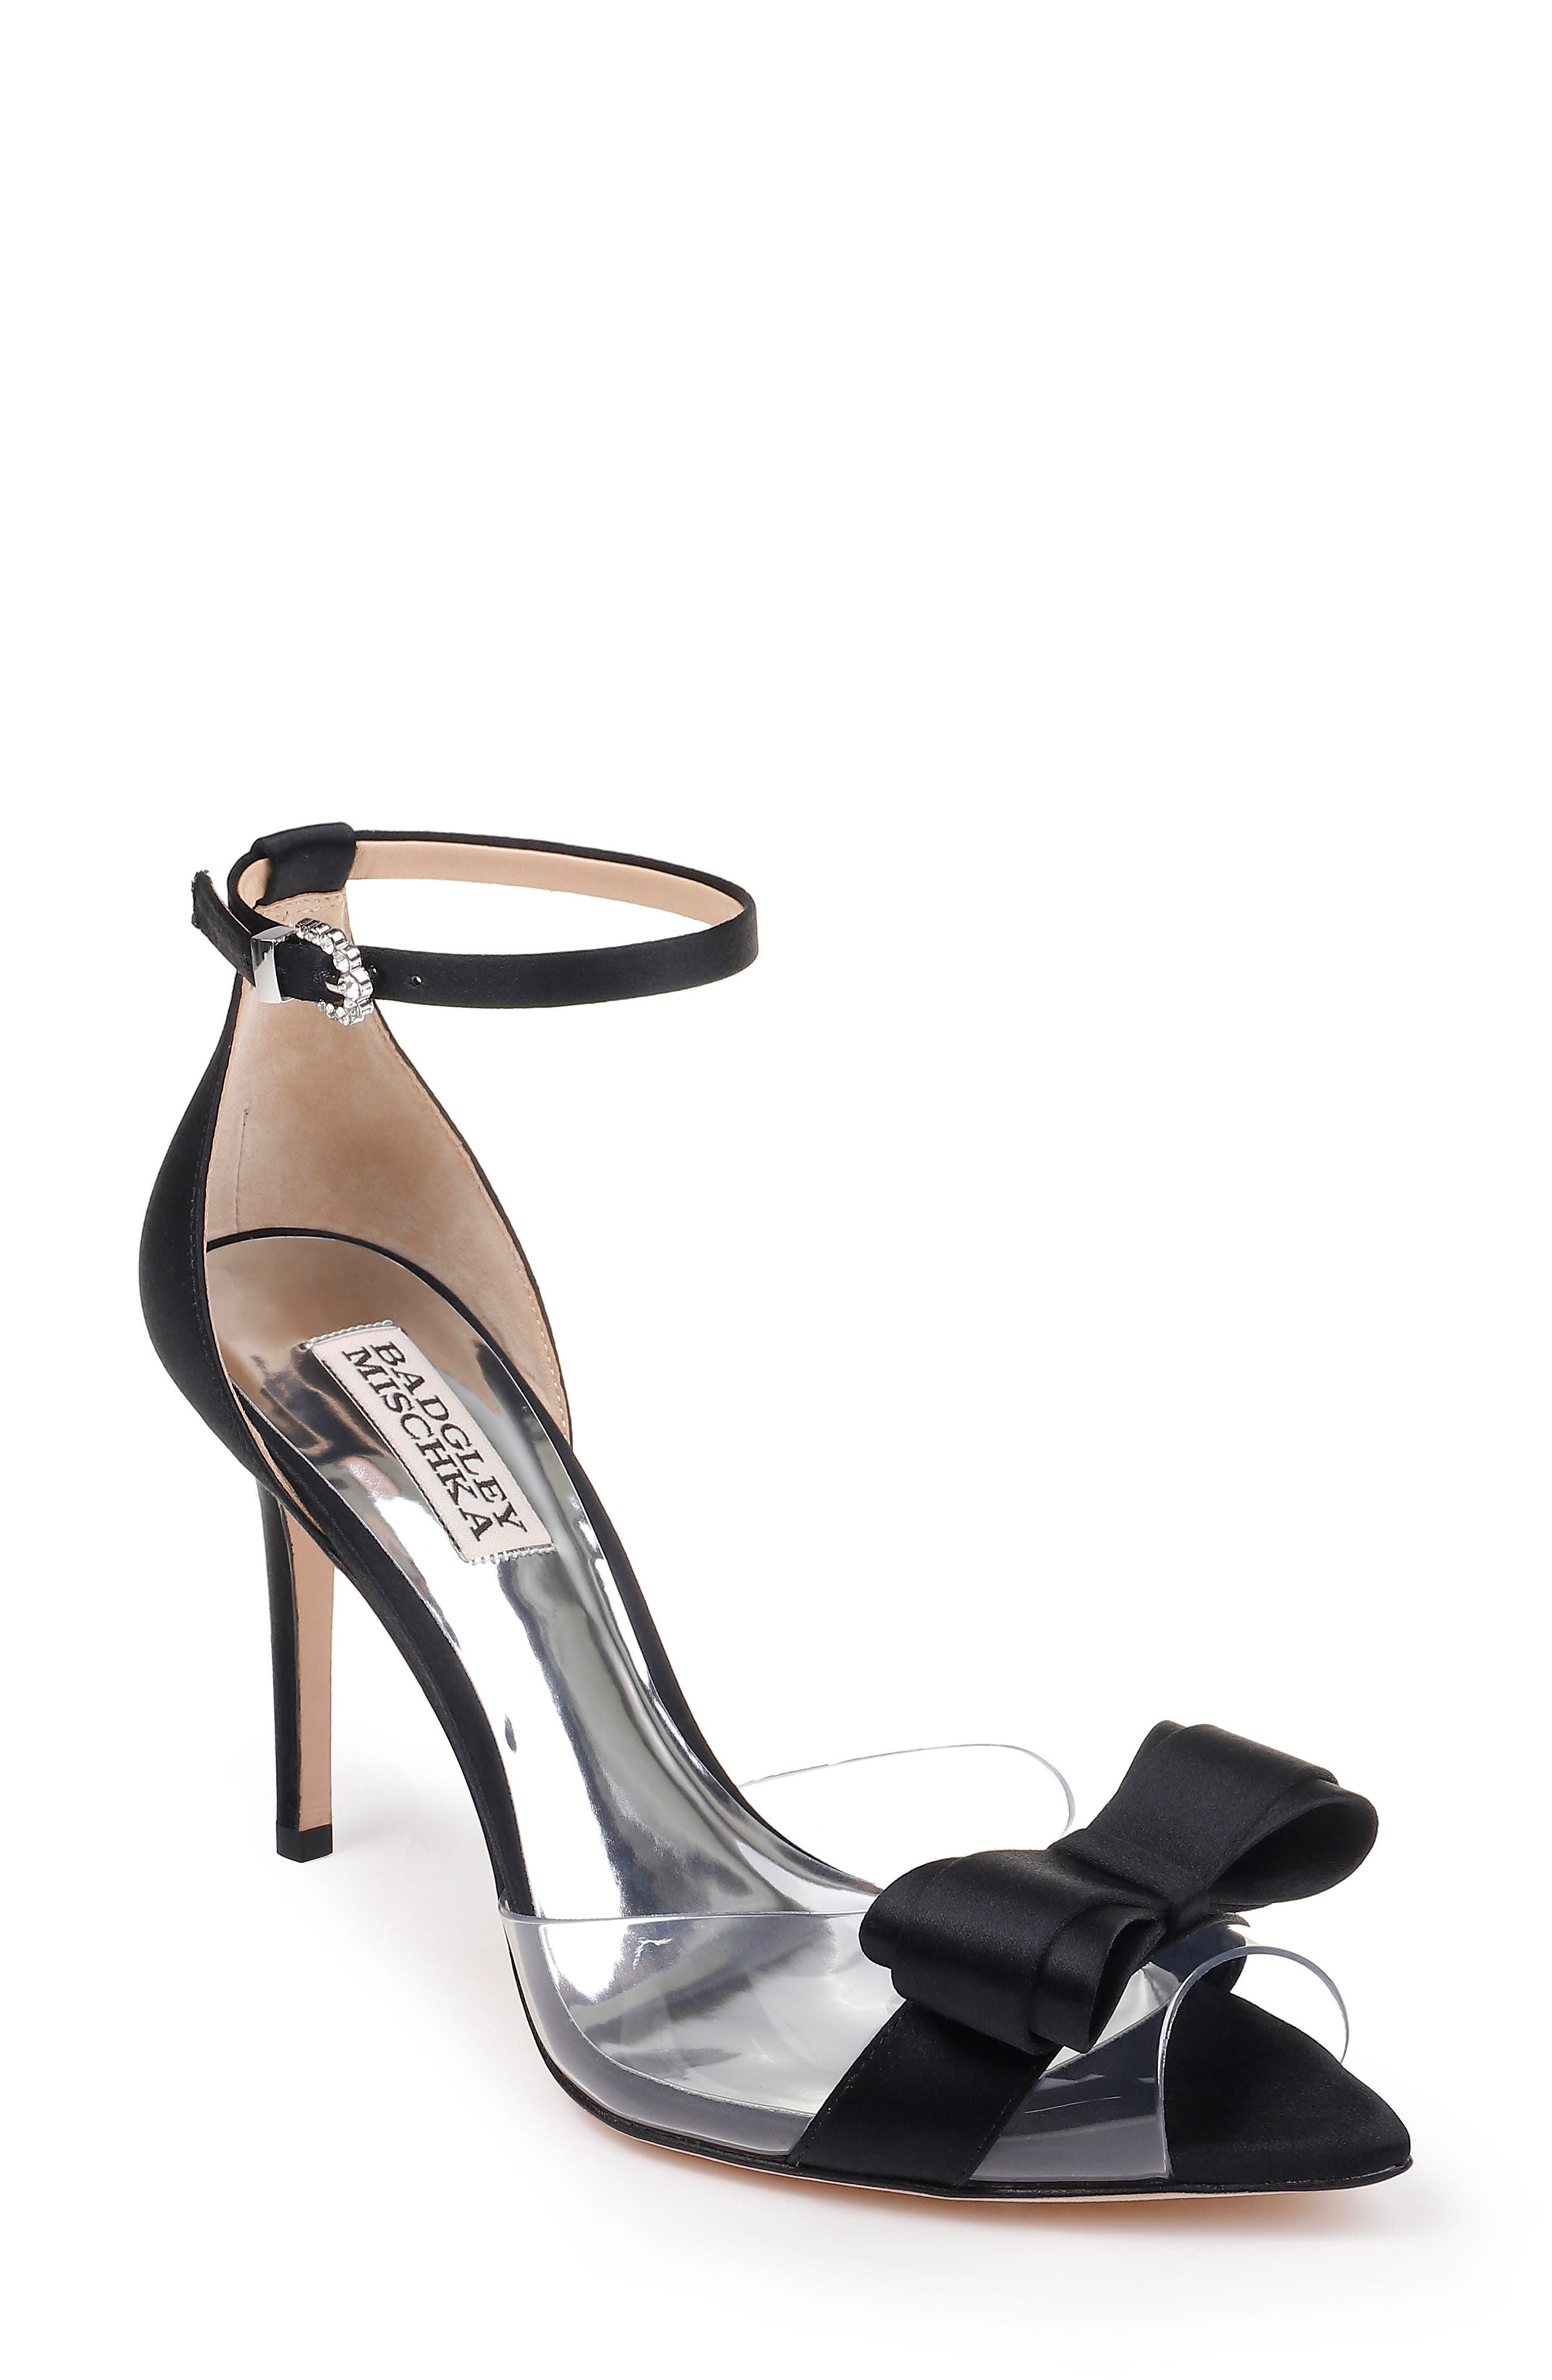 BADGLEY MISCHKA COLLECTION Badgley Mischka Lindsay Ankle Strap Sandal, Main, color, BLACK SATIN